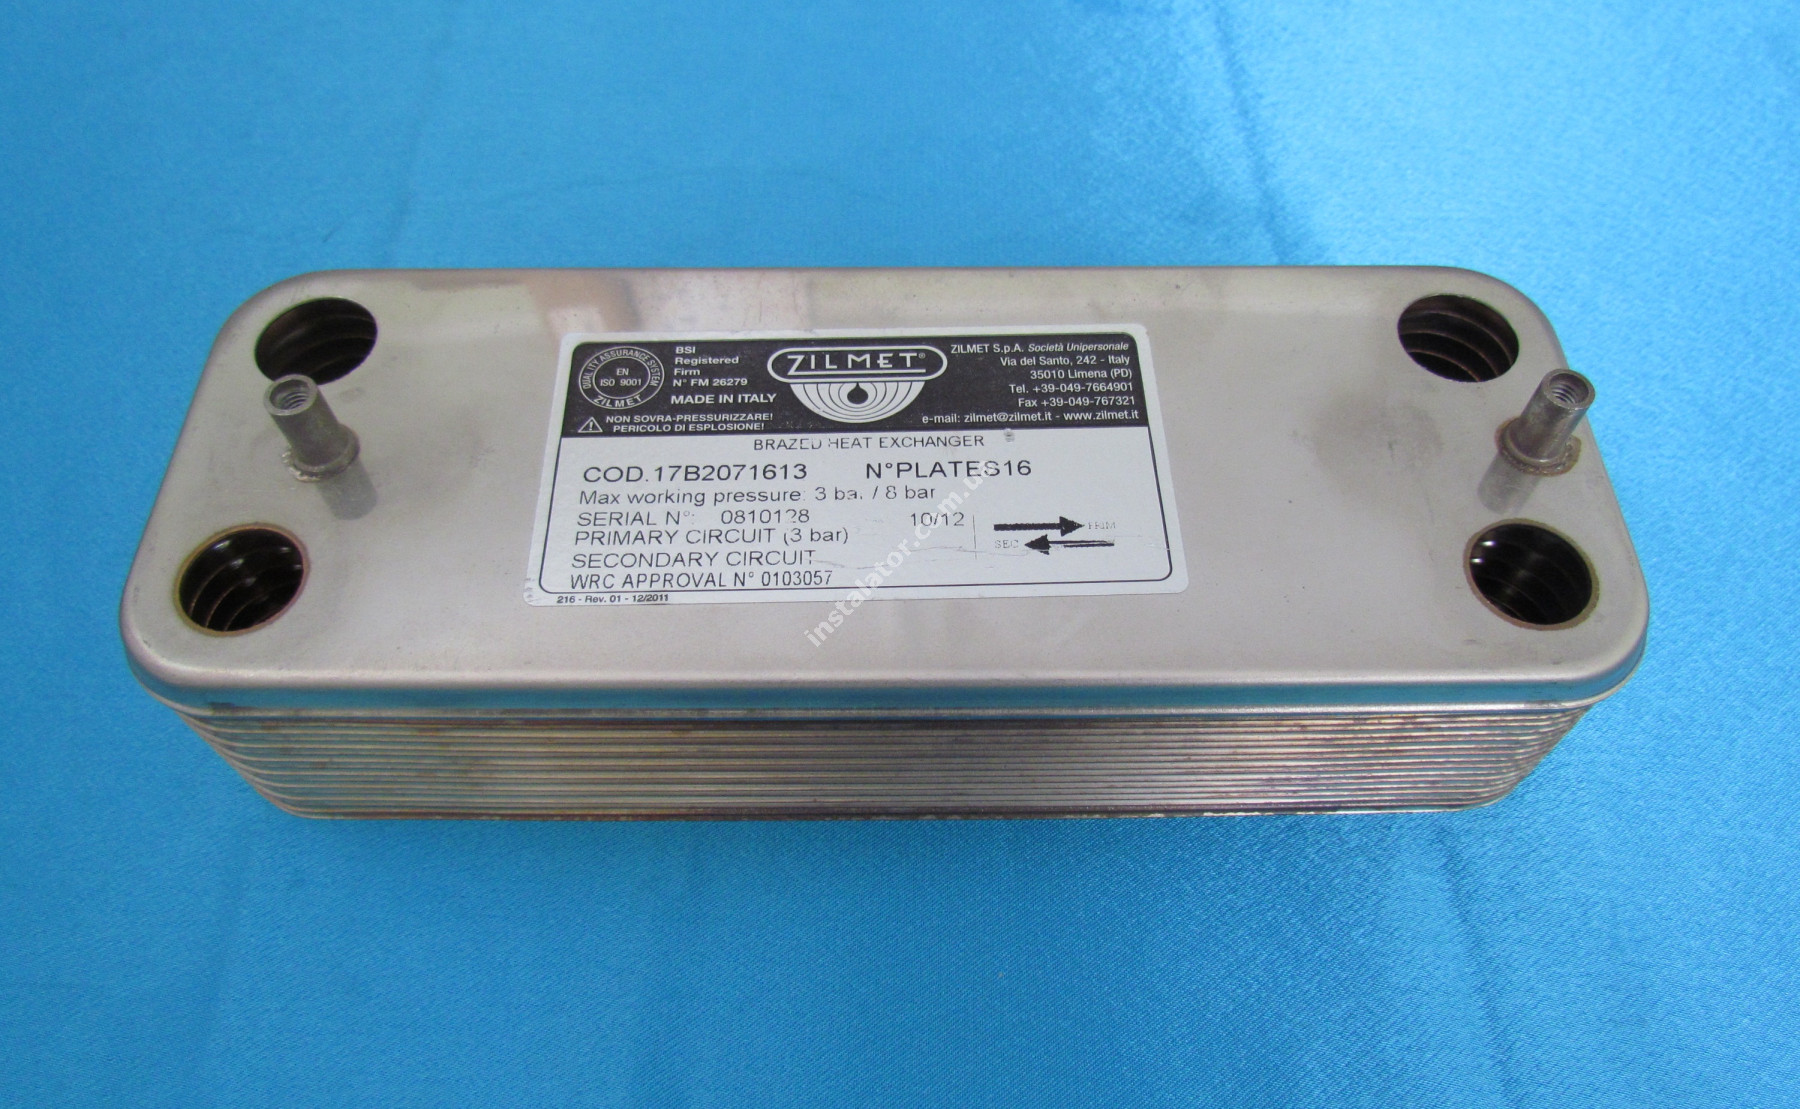 17B2071613 Теплообмінник вторинний ГВП 16 пластин SAUNIER DUVAL, ZILMET full-image-1